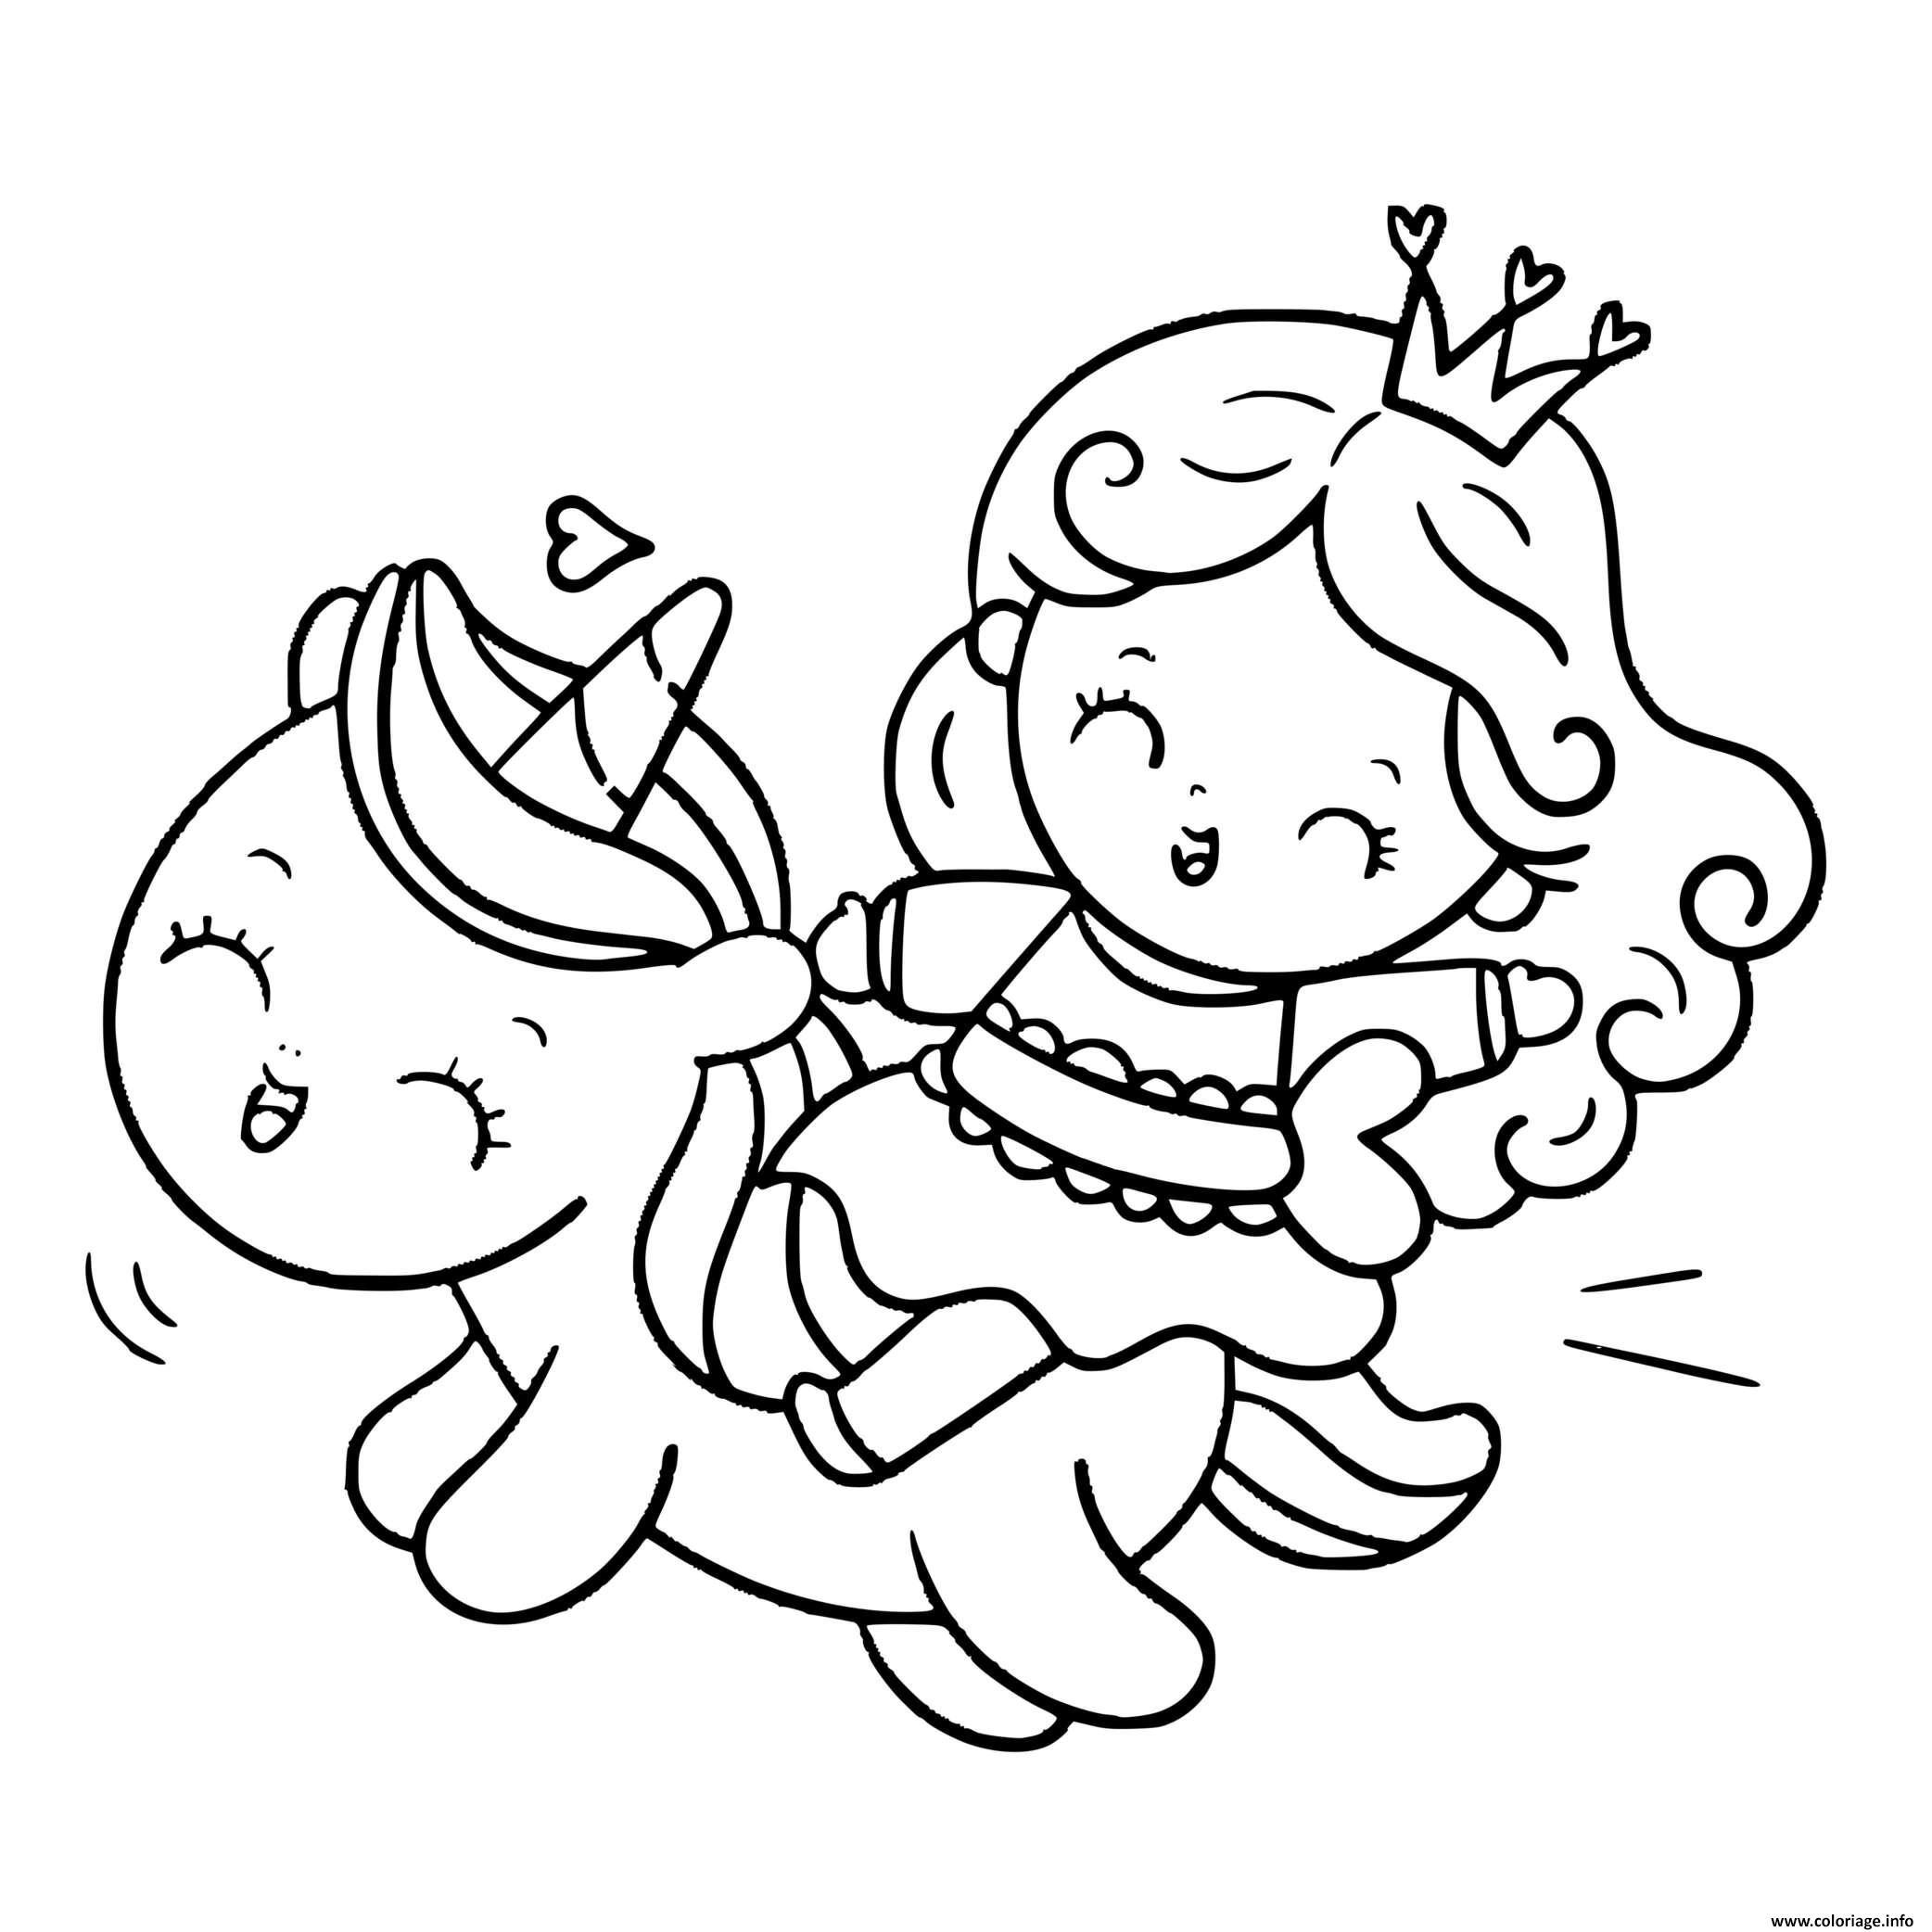 Coloriage licorne princesse et coeurs   JeColorie.com